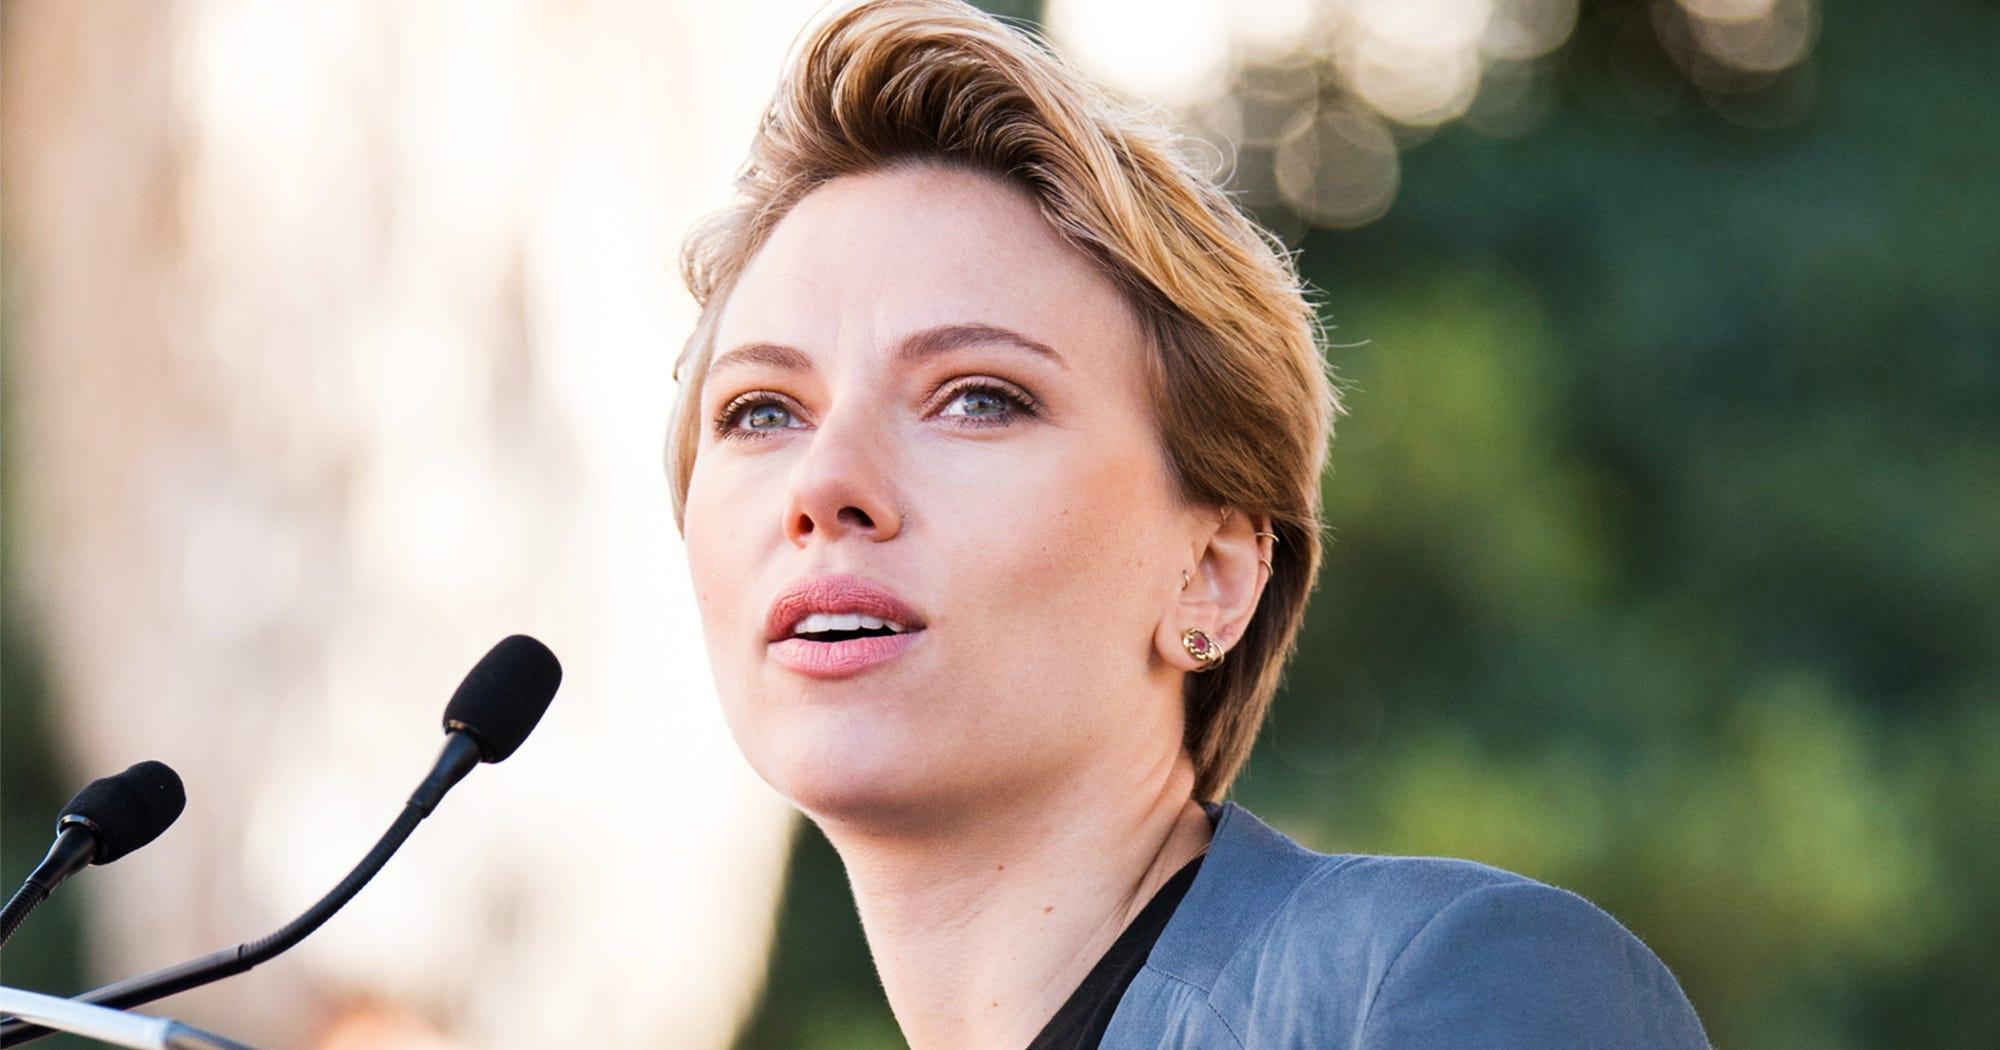 pictures Scarlett Johansson Reveals Her Body Hang Ups, Makes Us All Feel A Little Bit Better